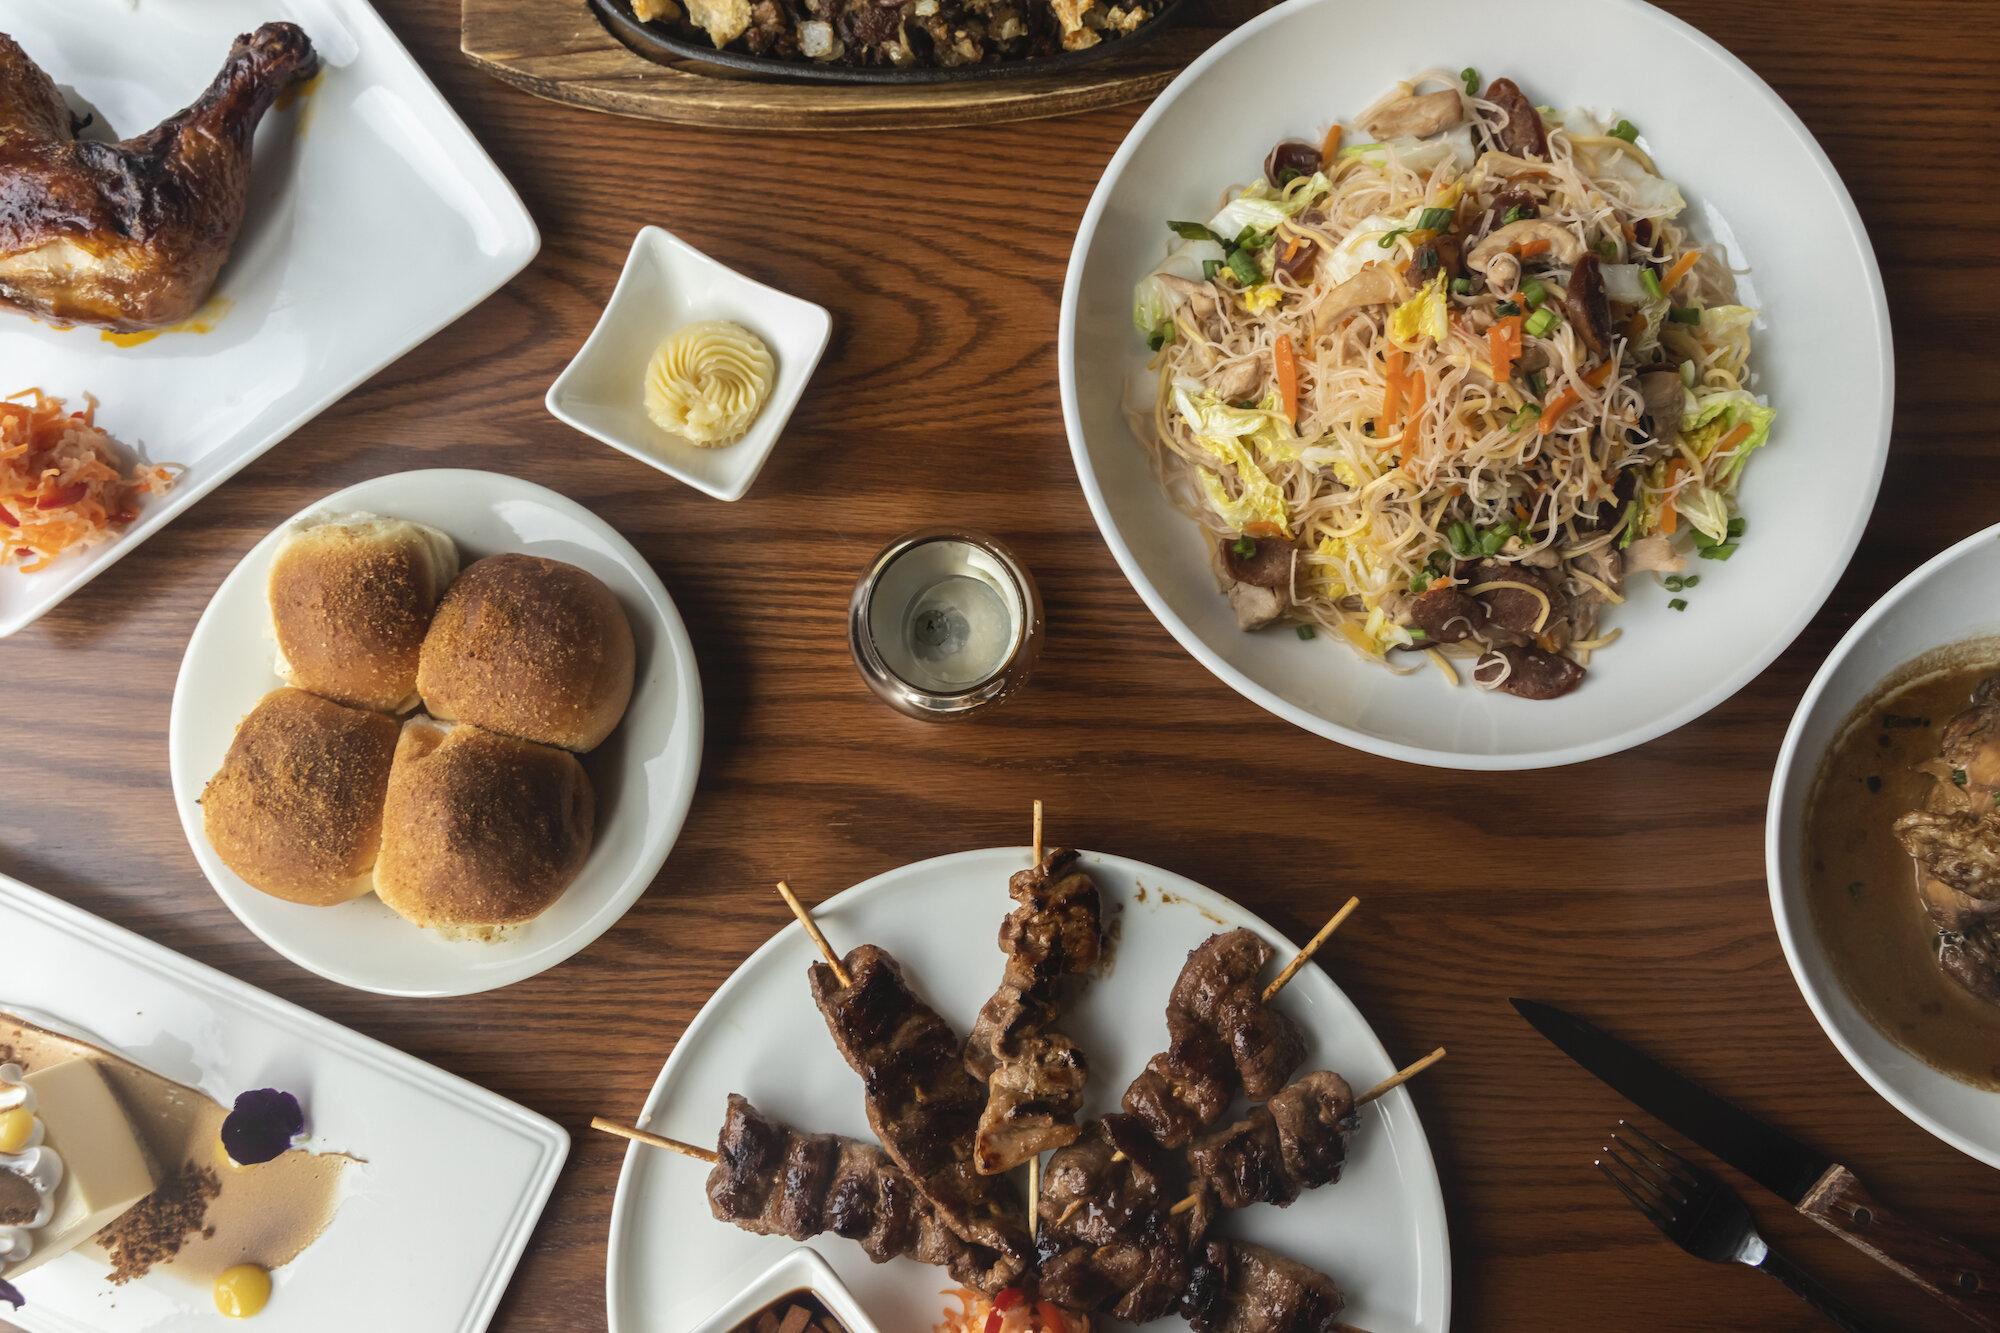 Cebu A Taste Of The Philippines In Chicago